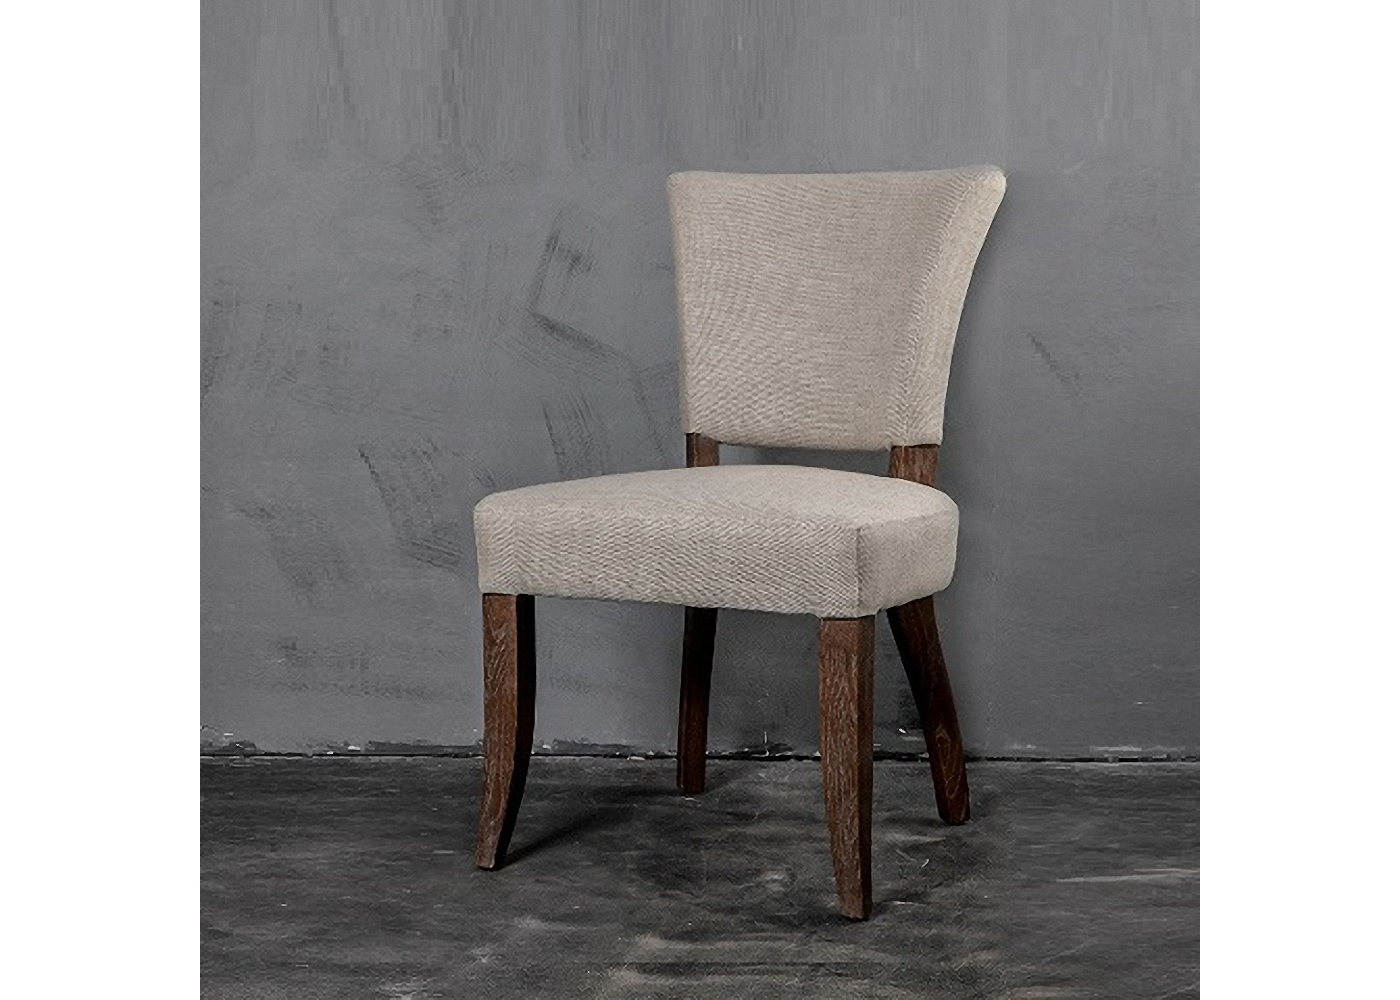 Стул МачингОбеденные стулья<br><br><br>Material: Лен<br>Width см: 54<br>Depth см: 63<br>Height см: 89